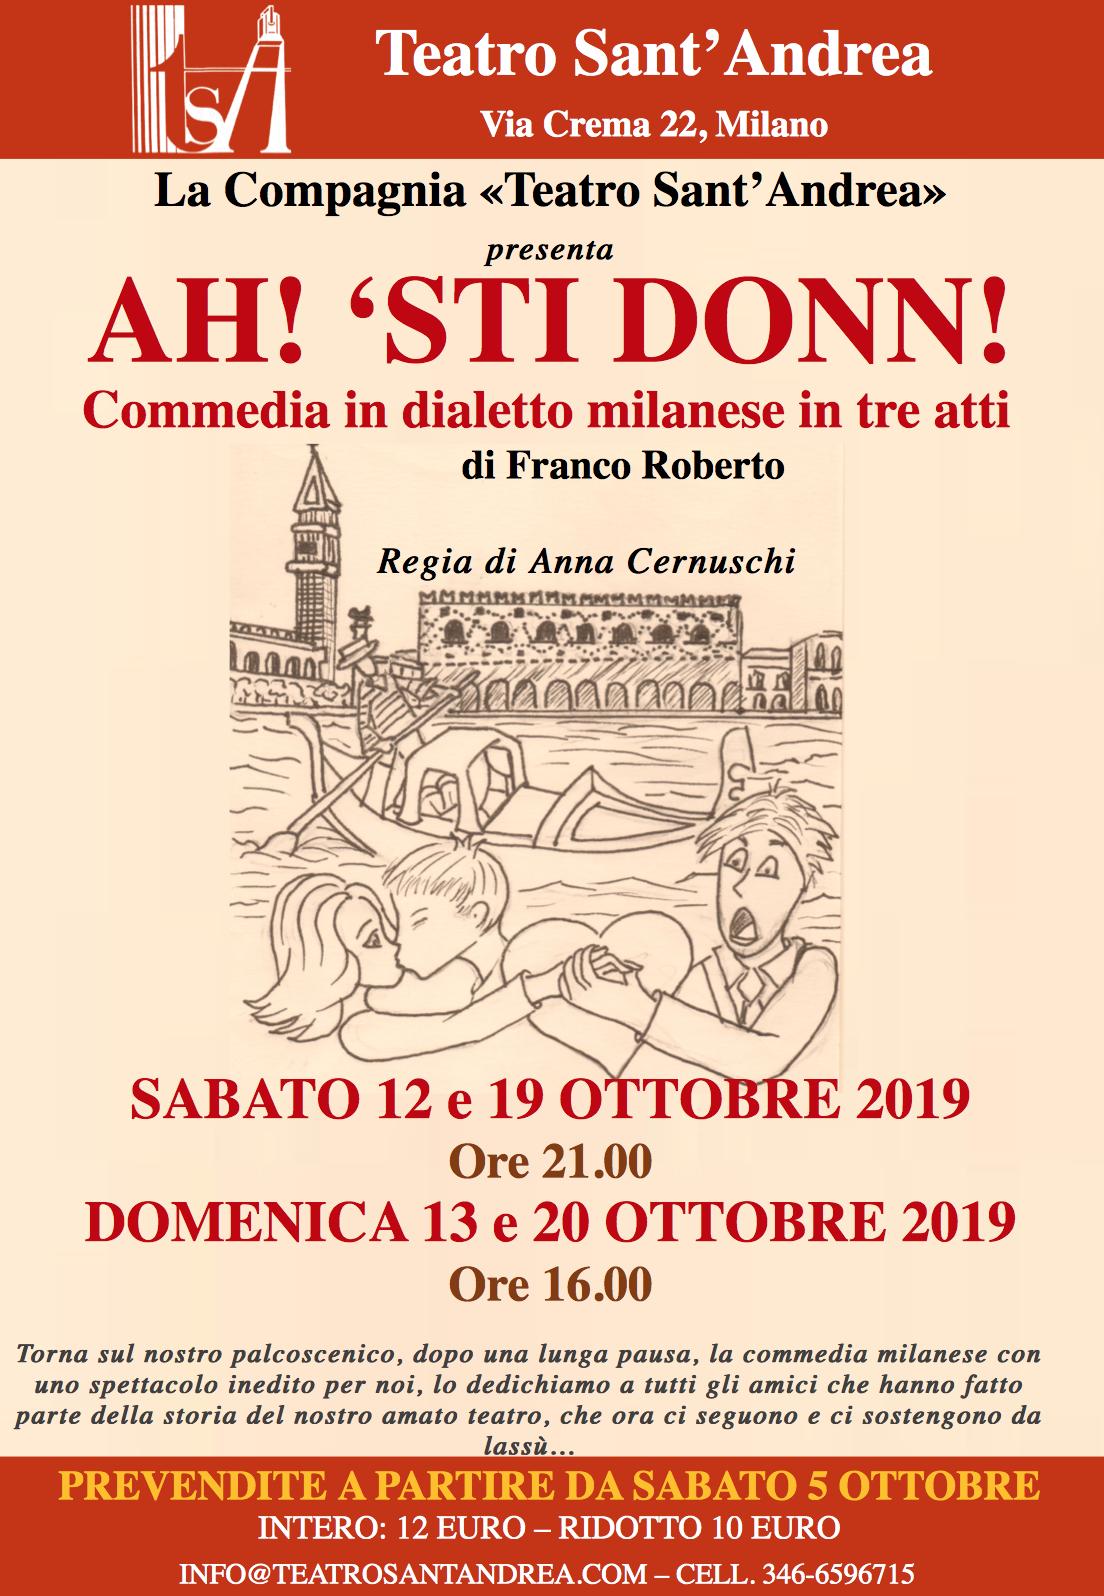 Ah! 'sti donn! @ Teatro Sant'Andrea